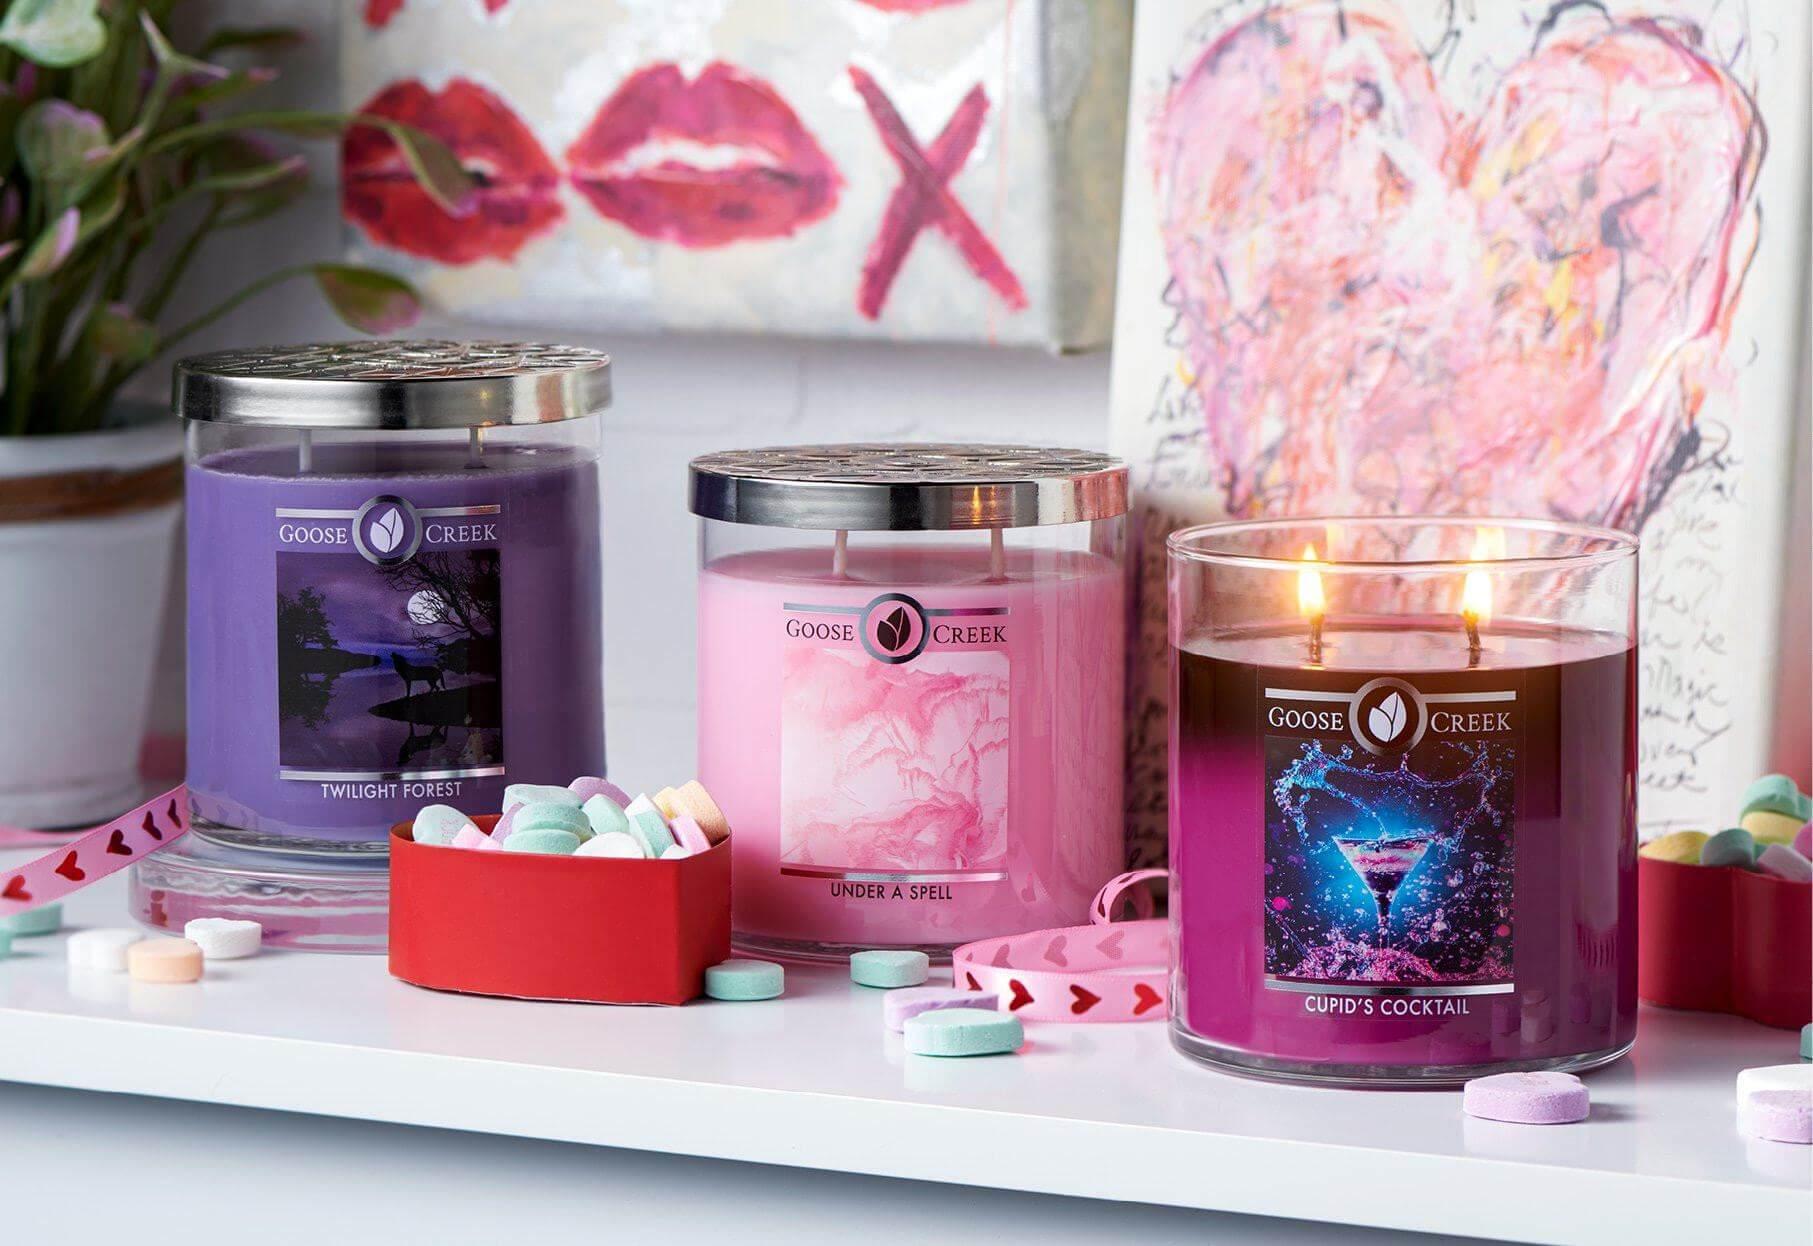 goose-creek-candle-tumbler-online-kaufen